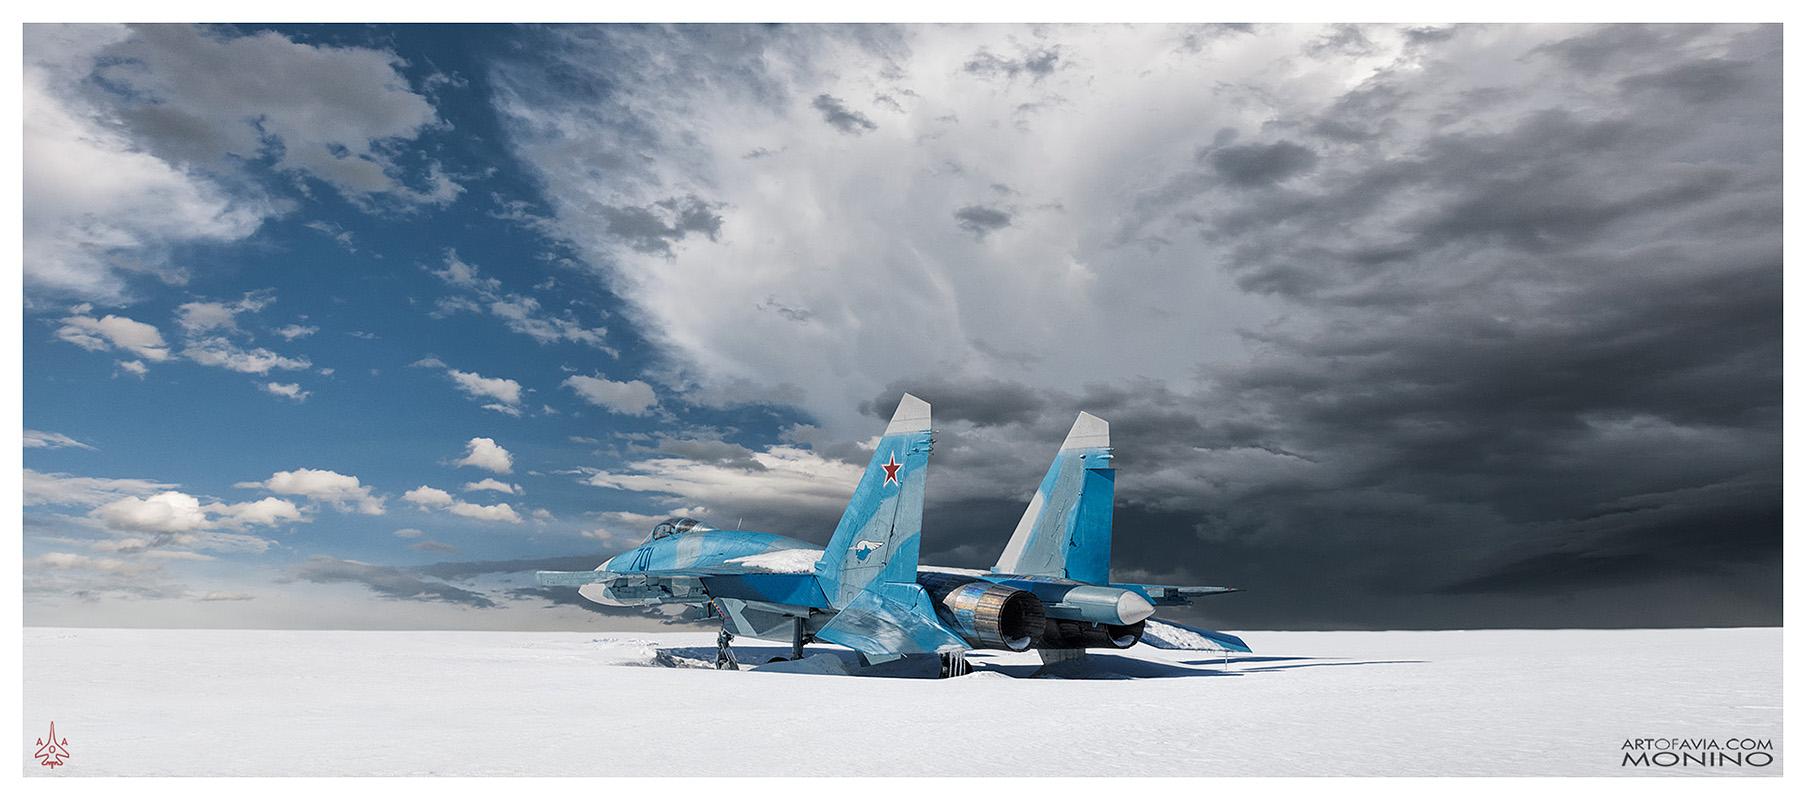 Sukhoi-Su-27M-Su-35-T-10M-Art-of-Avia-Central-Air-Force-Museum-Monino-by-Kent-Miklenda-CR1-800pxh-21-9-IL-A-BW.jpg